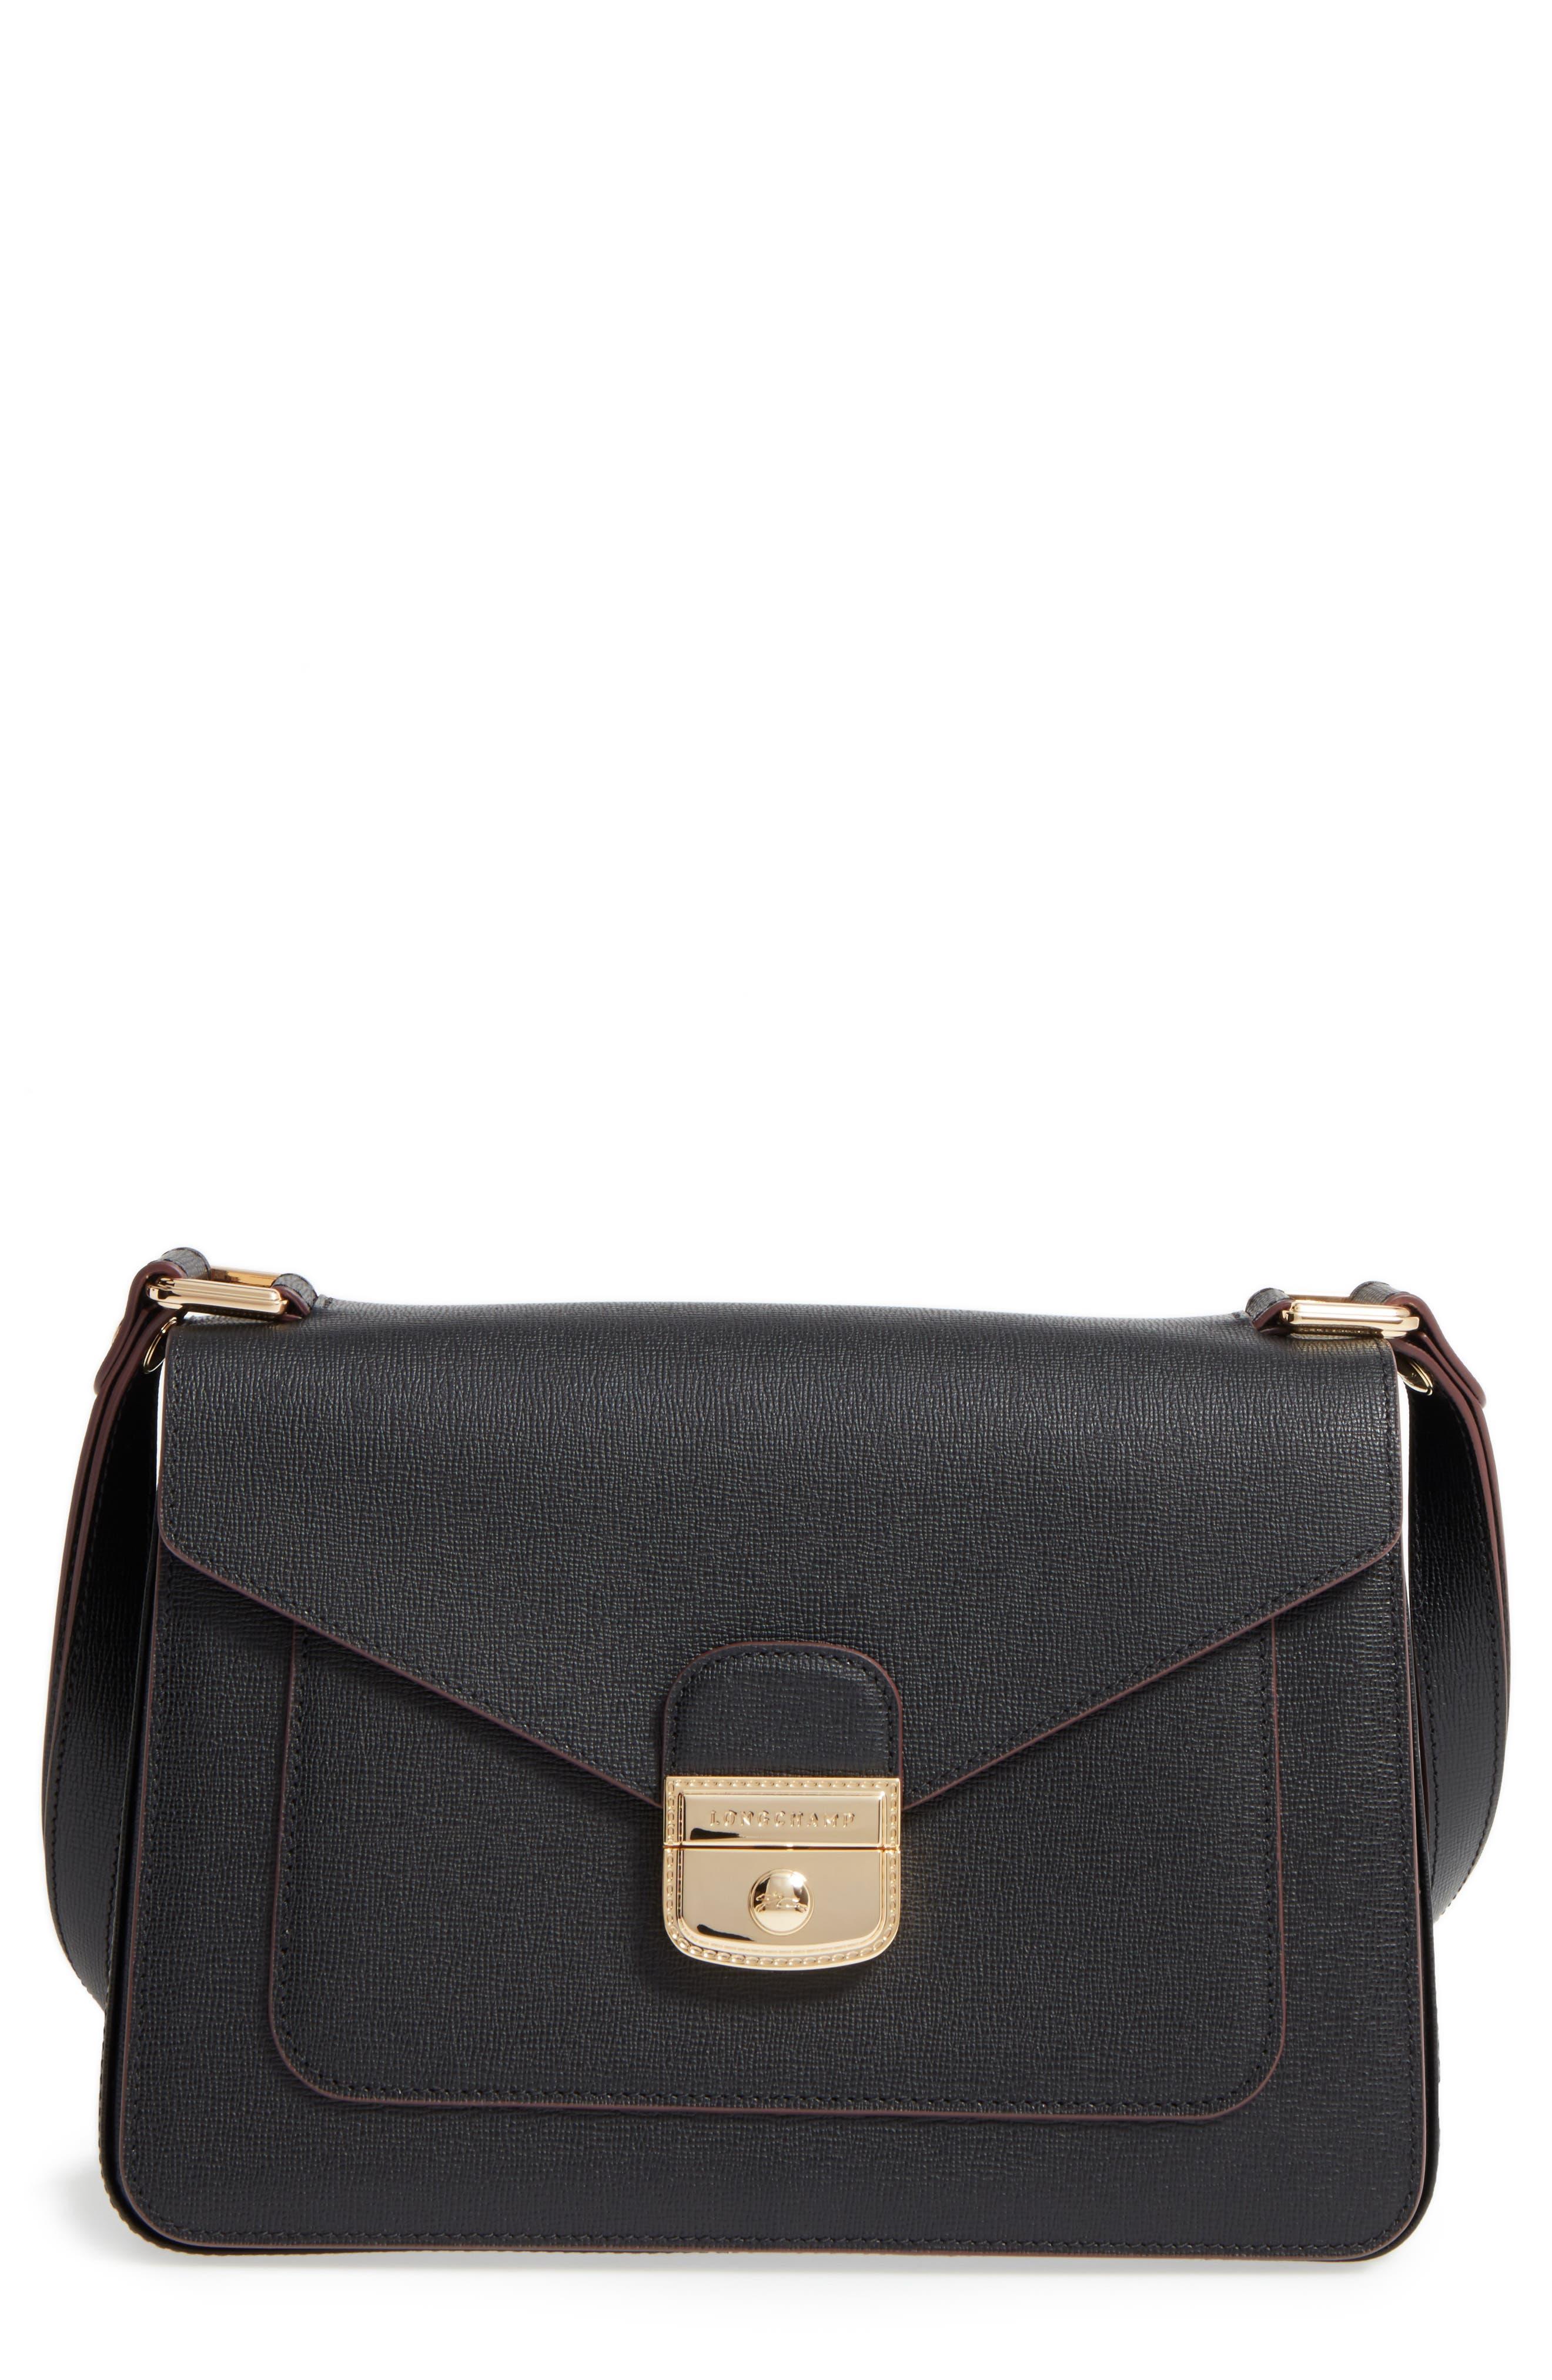 Pliage Heritage Leather Shoulder Bag,                             Main thumbnail 1, color,                             BLACK